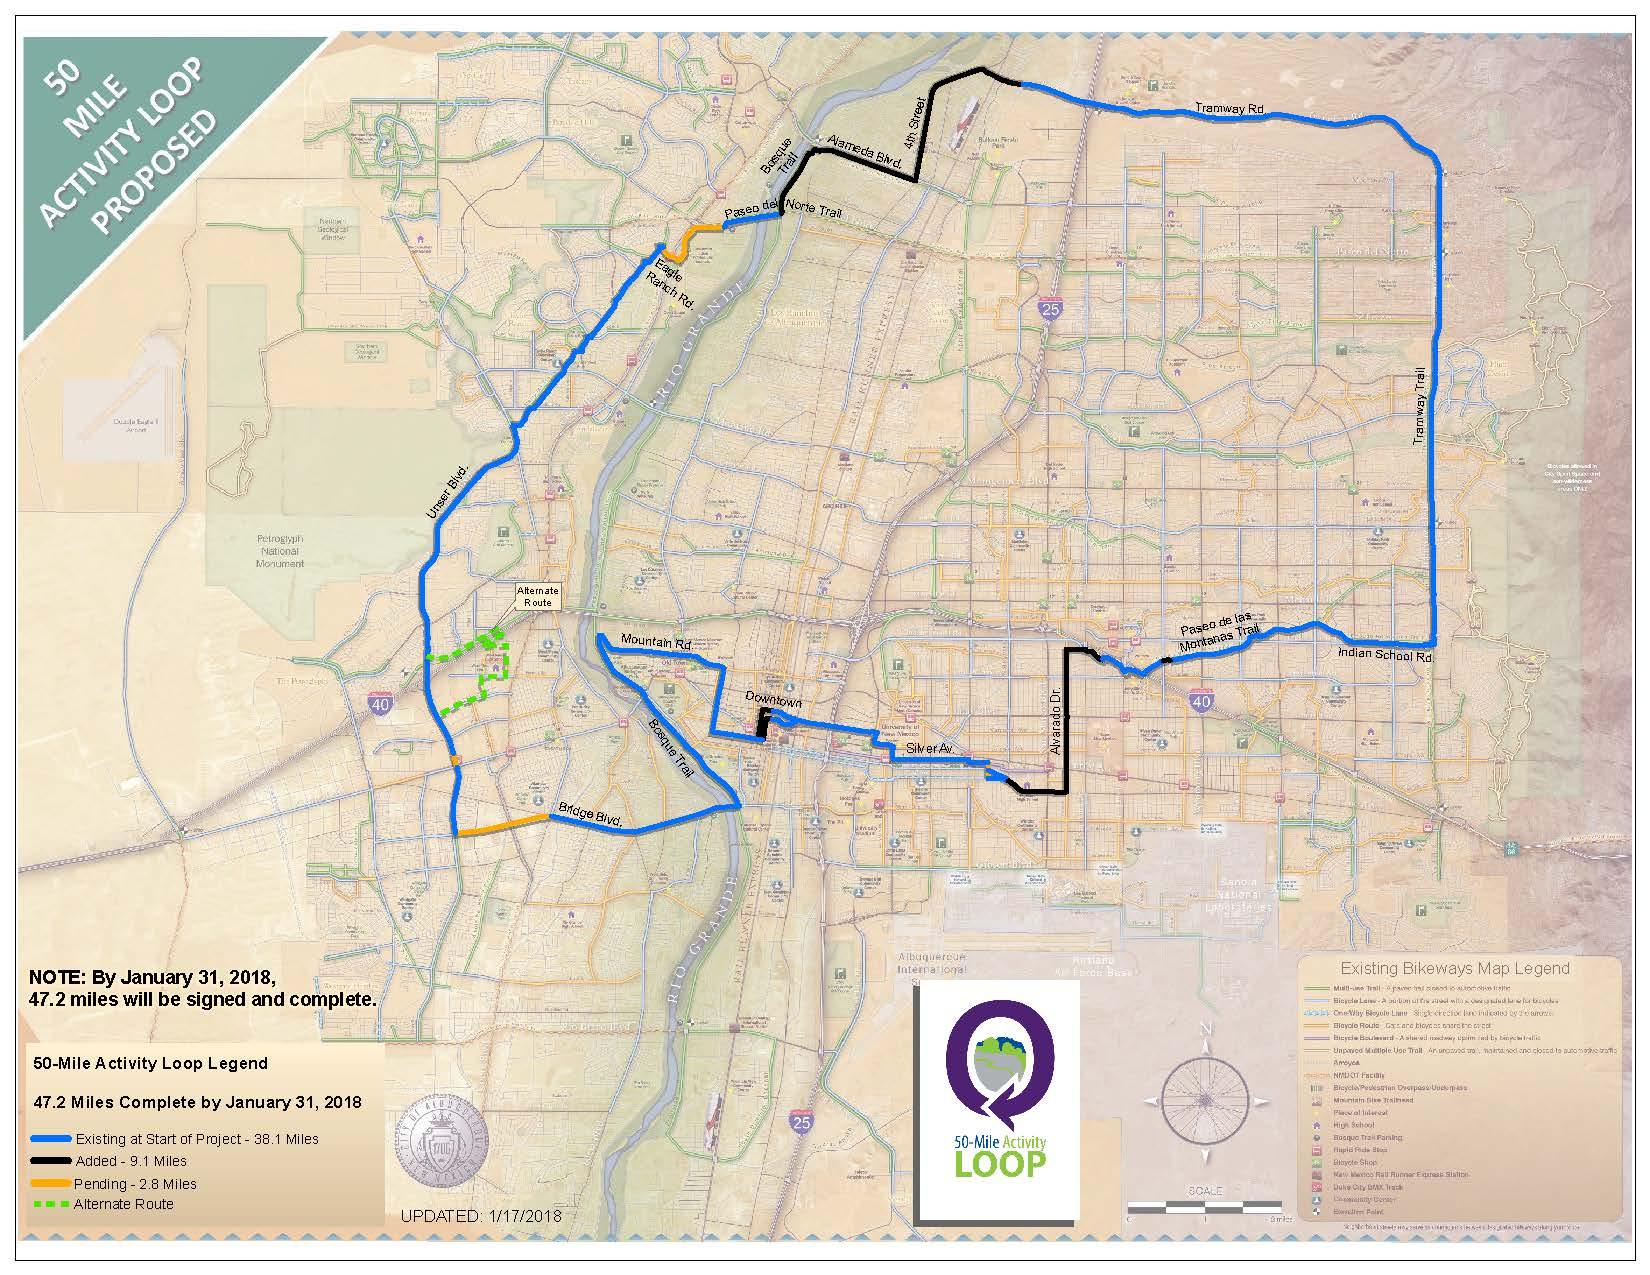 50Mile Activity Loop City of Albuquerque